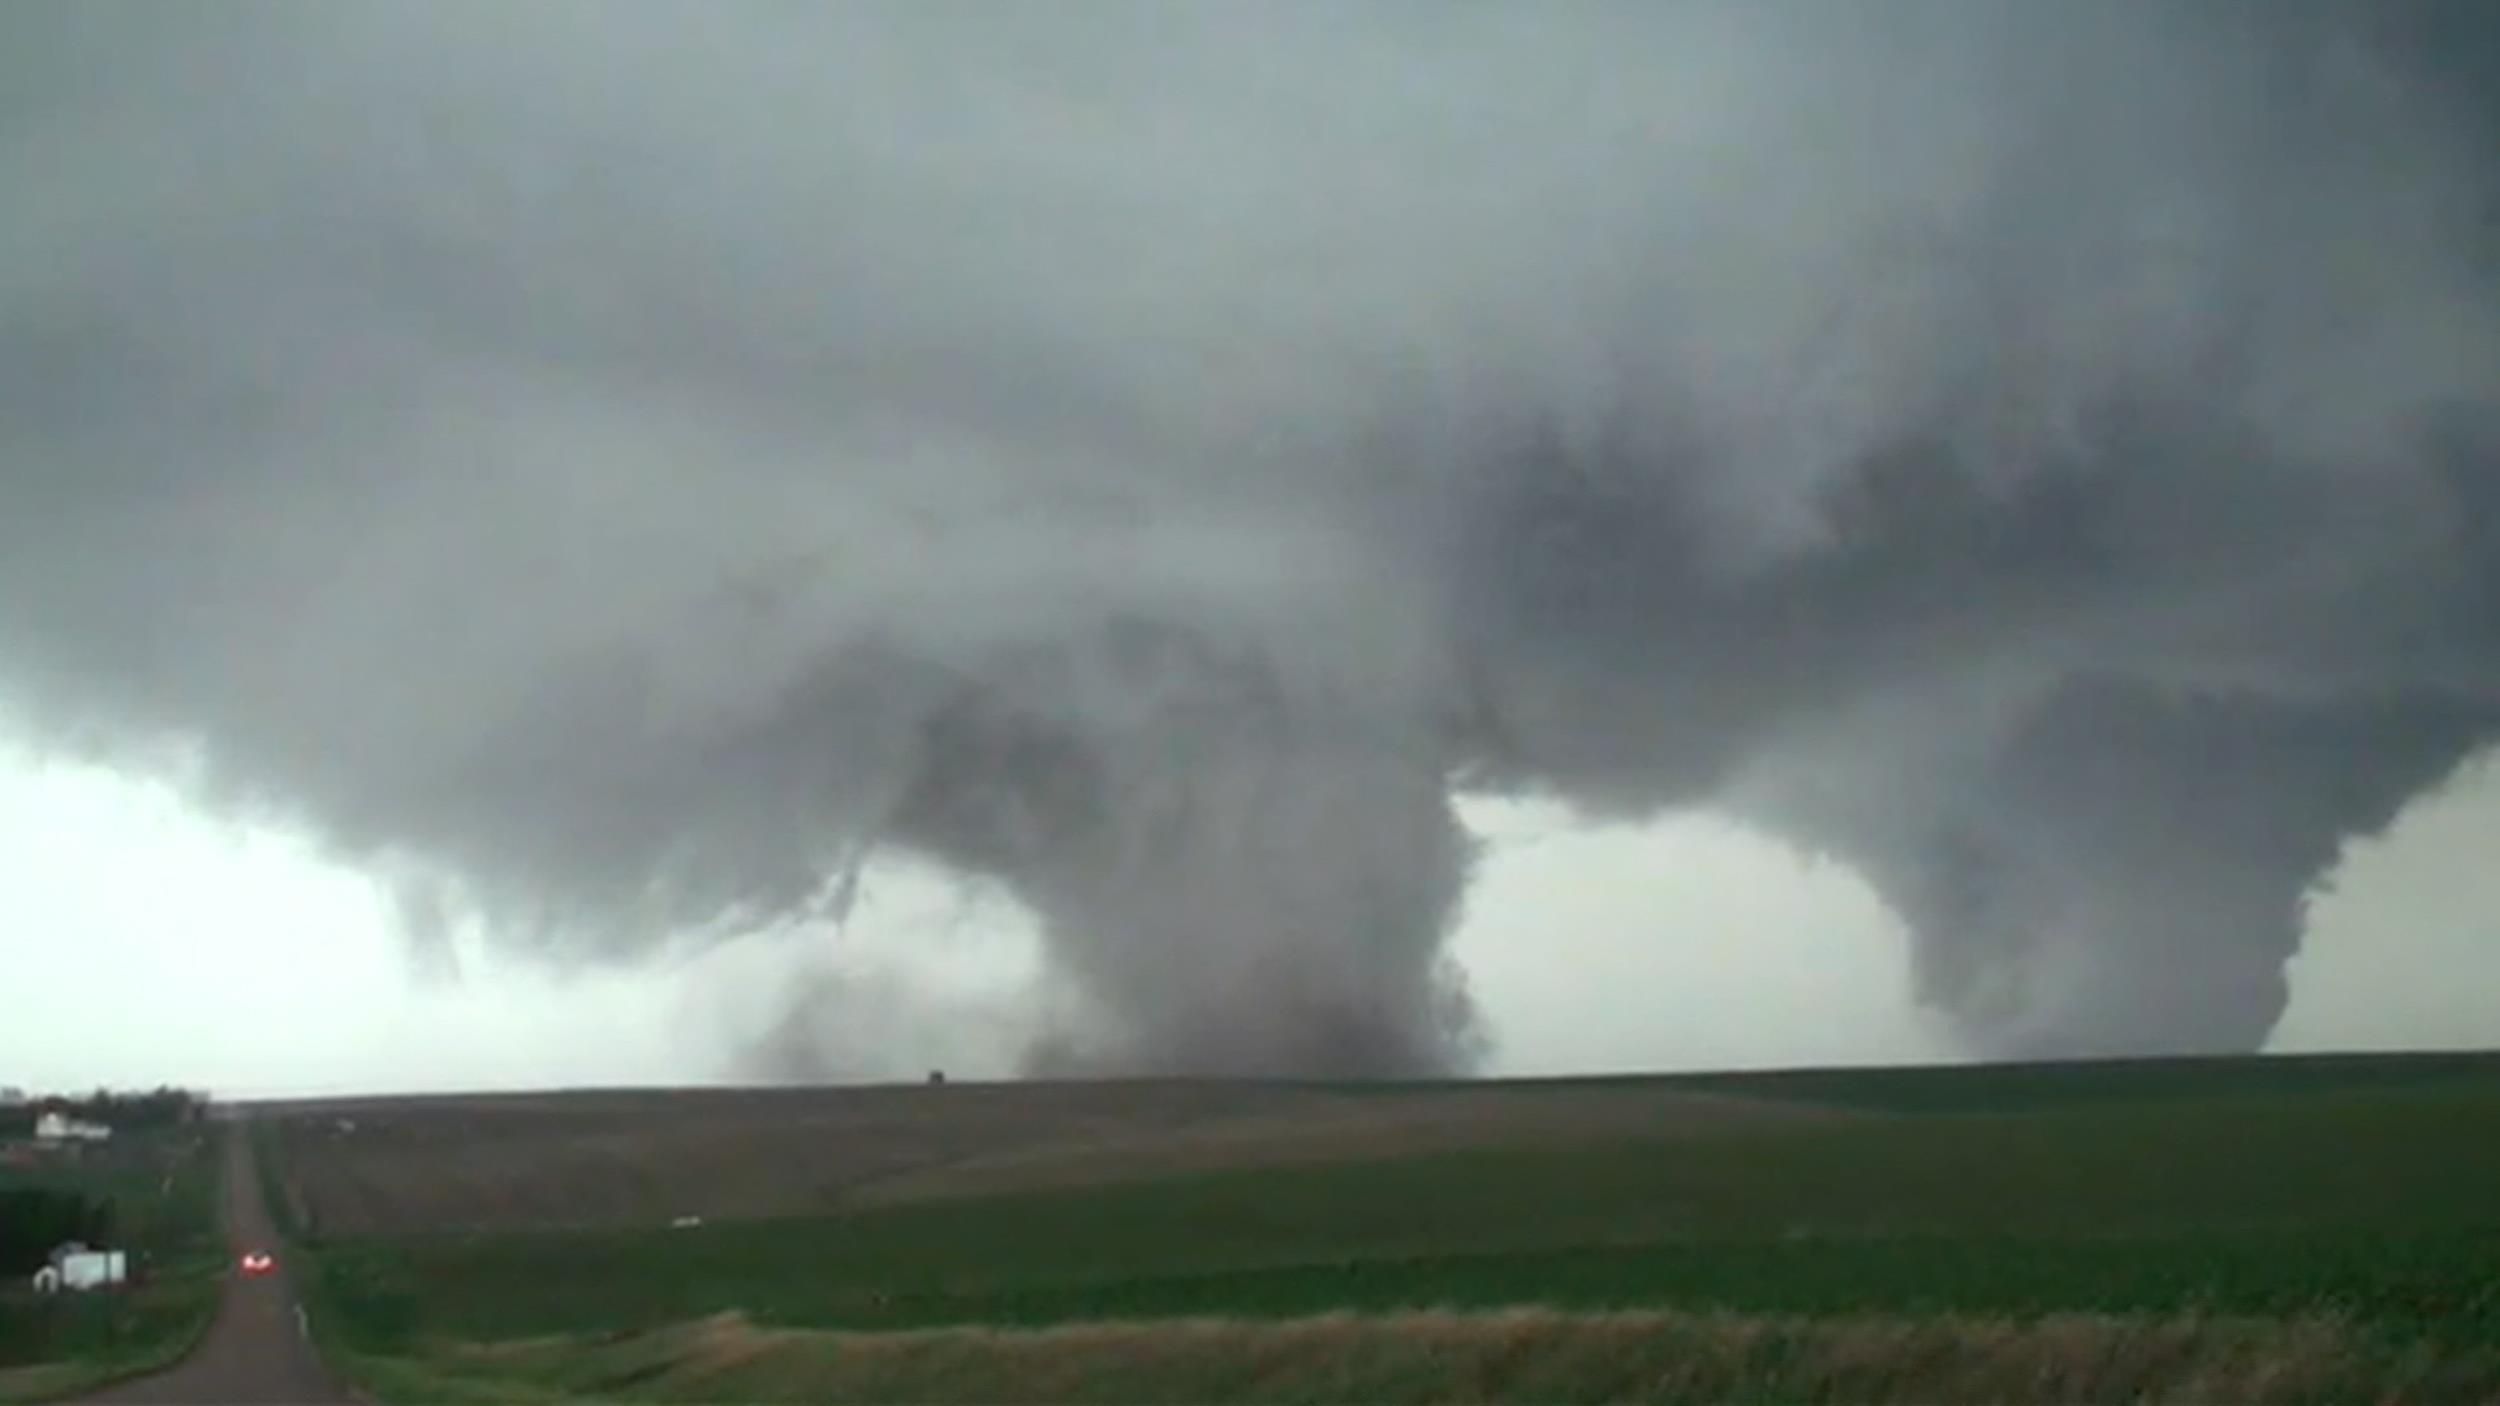 Twin Tornadoes Ravage Small Town in Nebraska Monday Evening